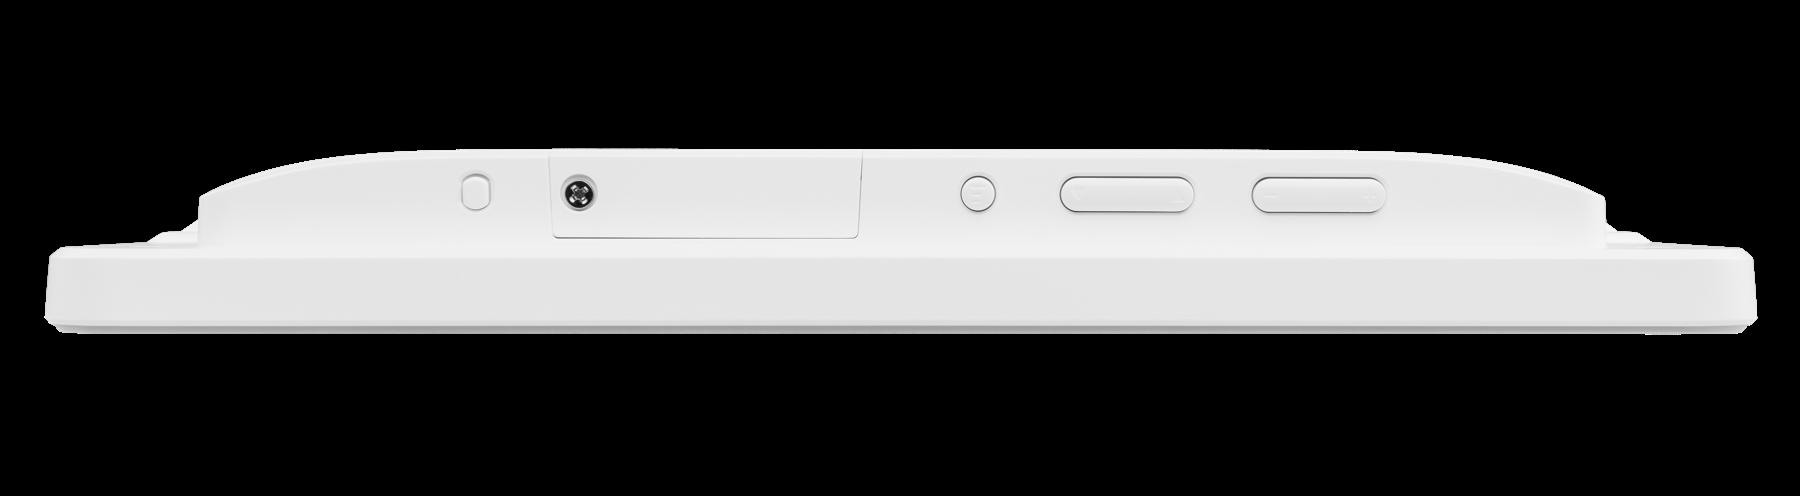 88902020 238 APPC 10 XPL NFC white side top s1800x